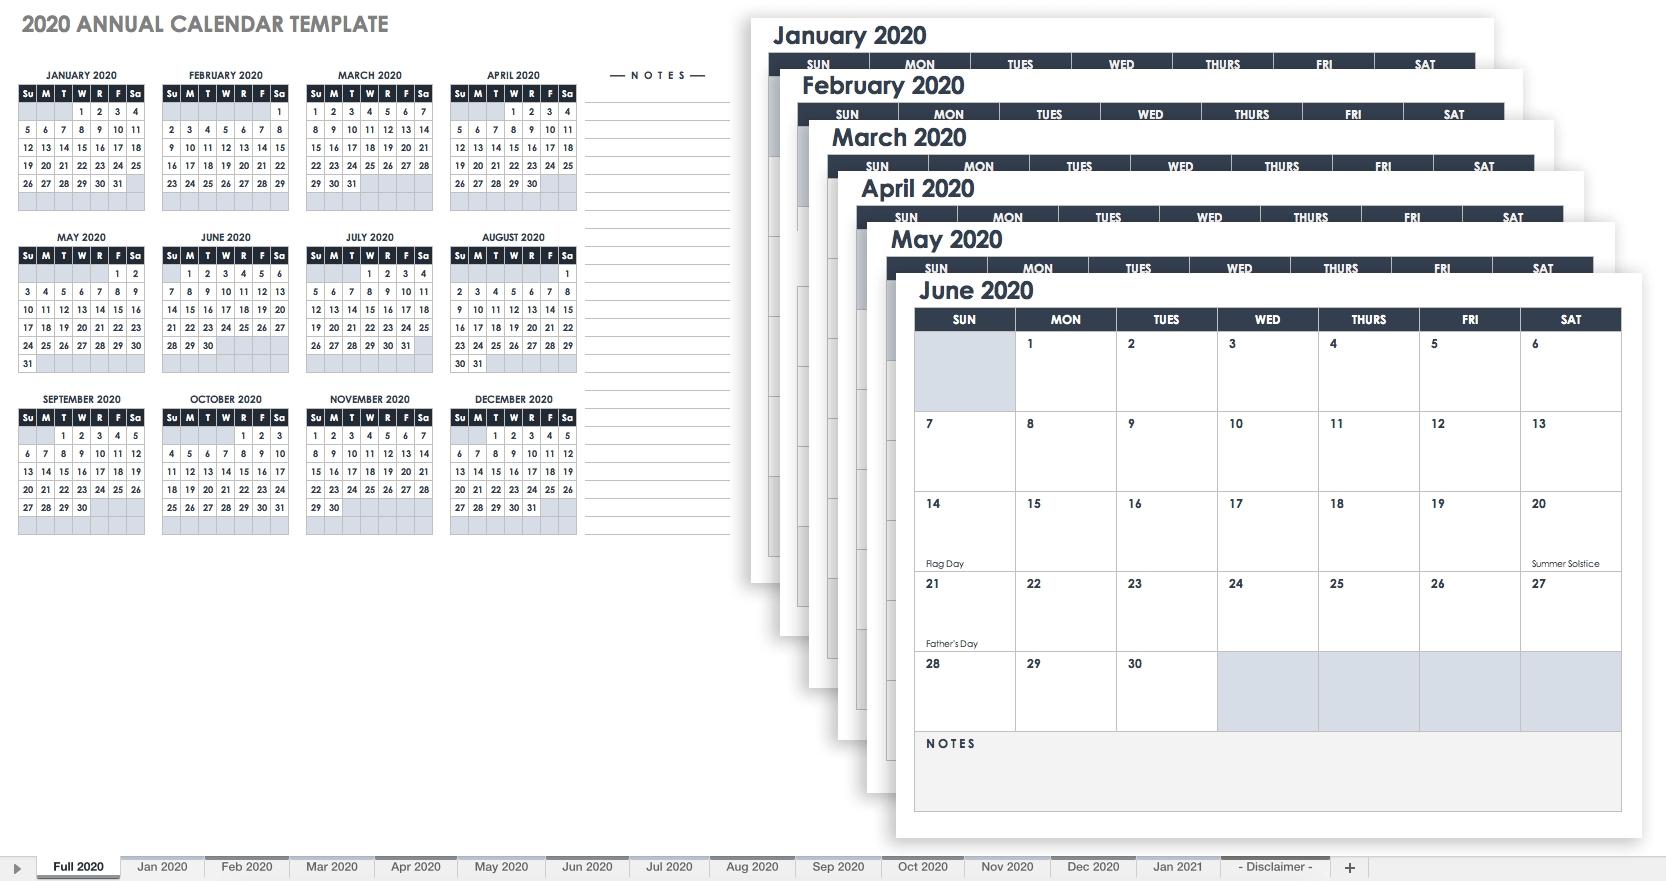 Free Excel Calendar Templates inside Basic Monthly Calendar For Editing